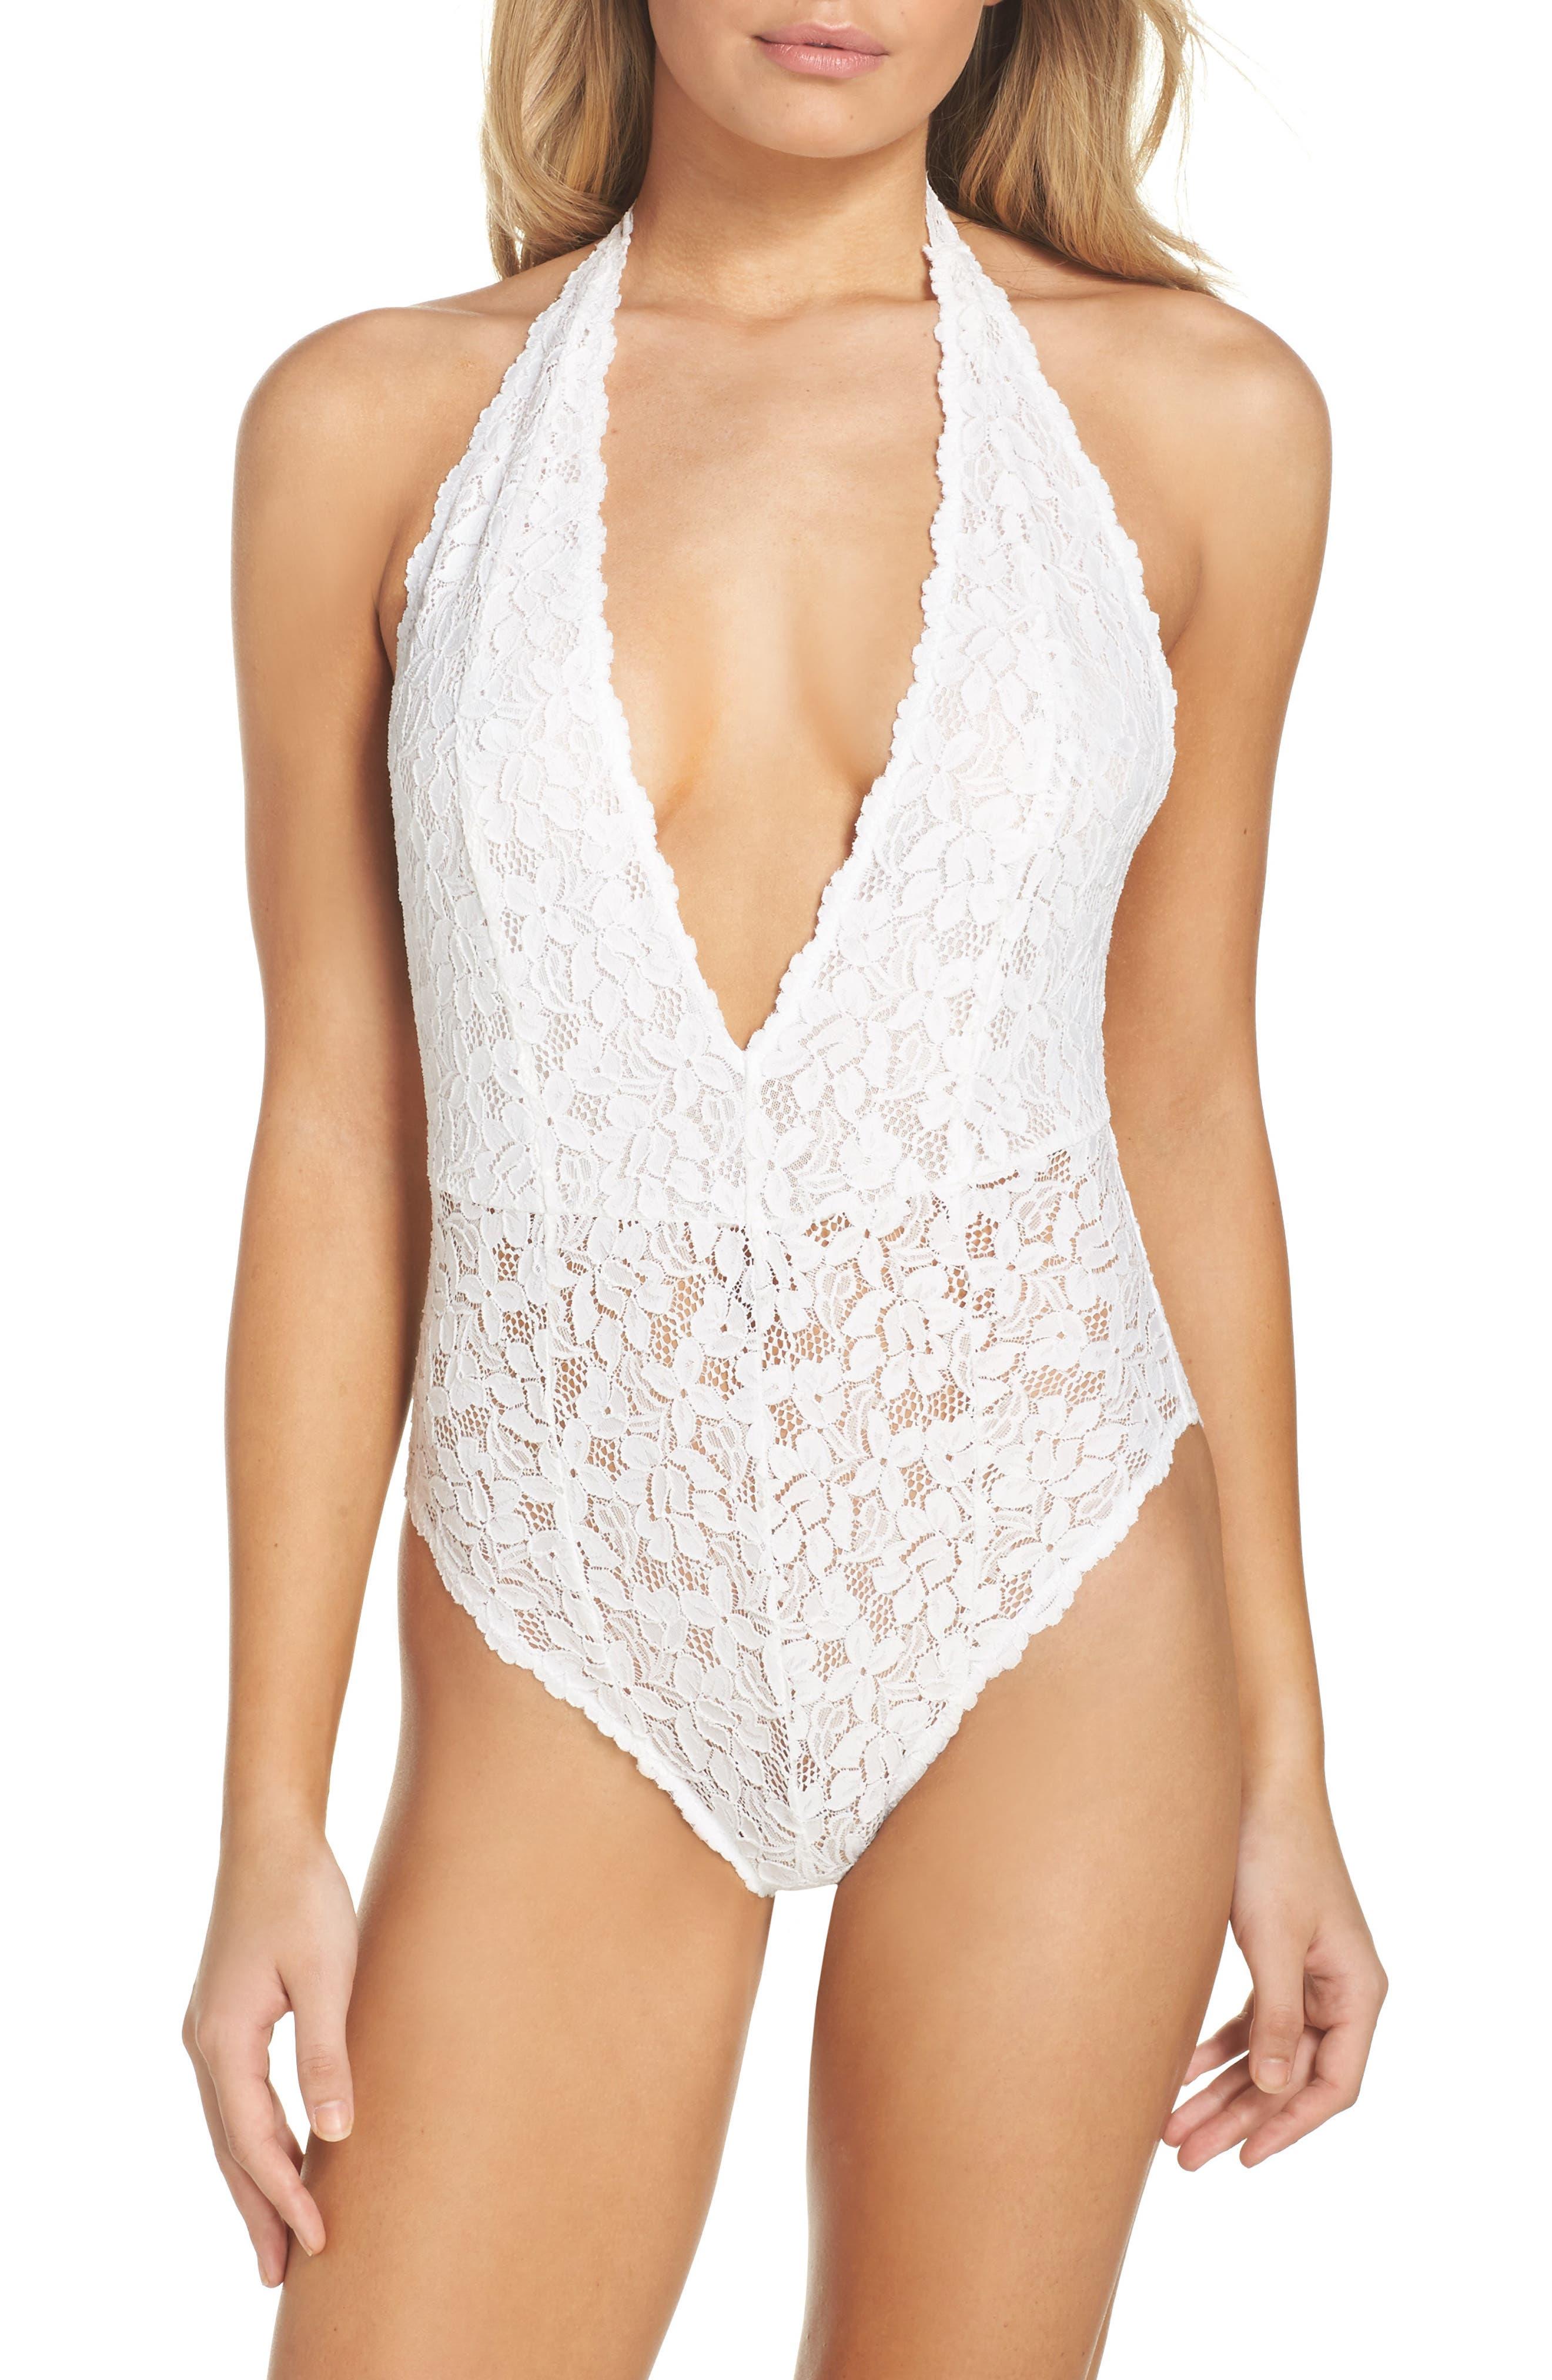 Intimately FP Avery Lace Bodysuit,                             Main thumbnail 1, color,                             WHITE